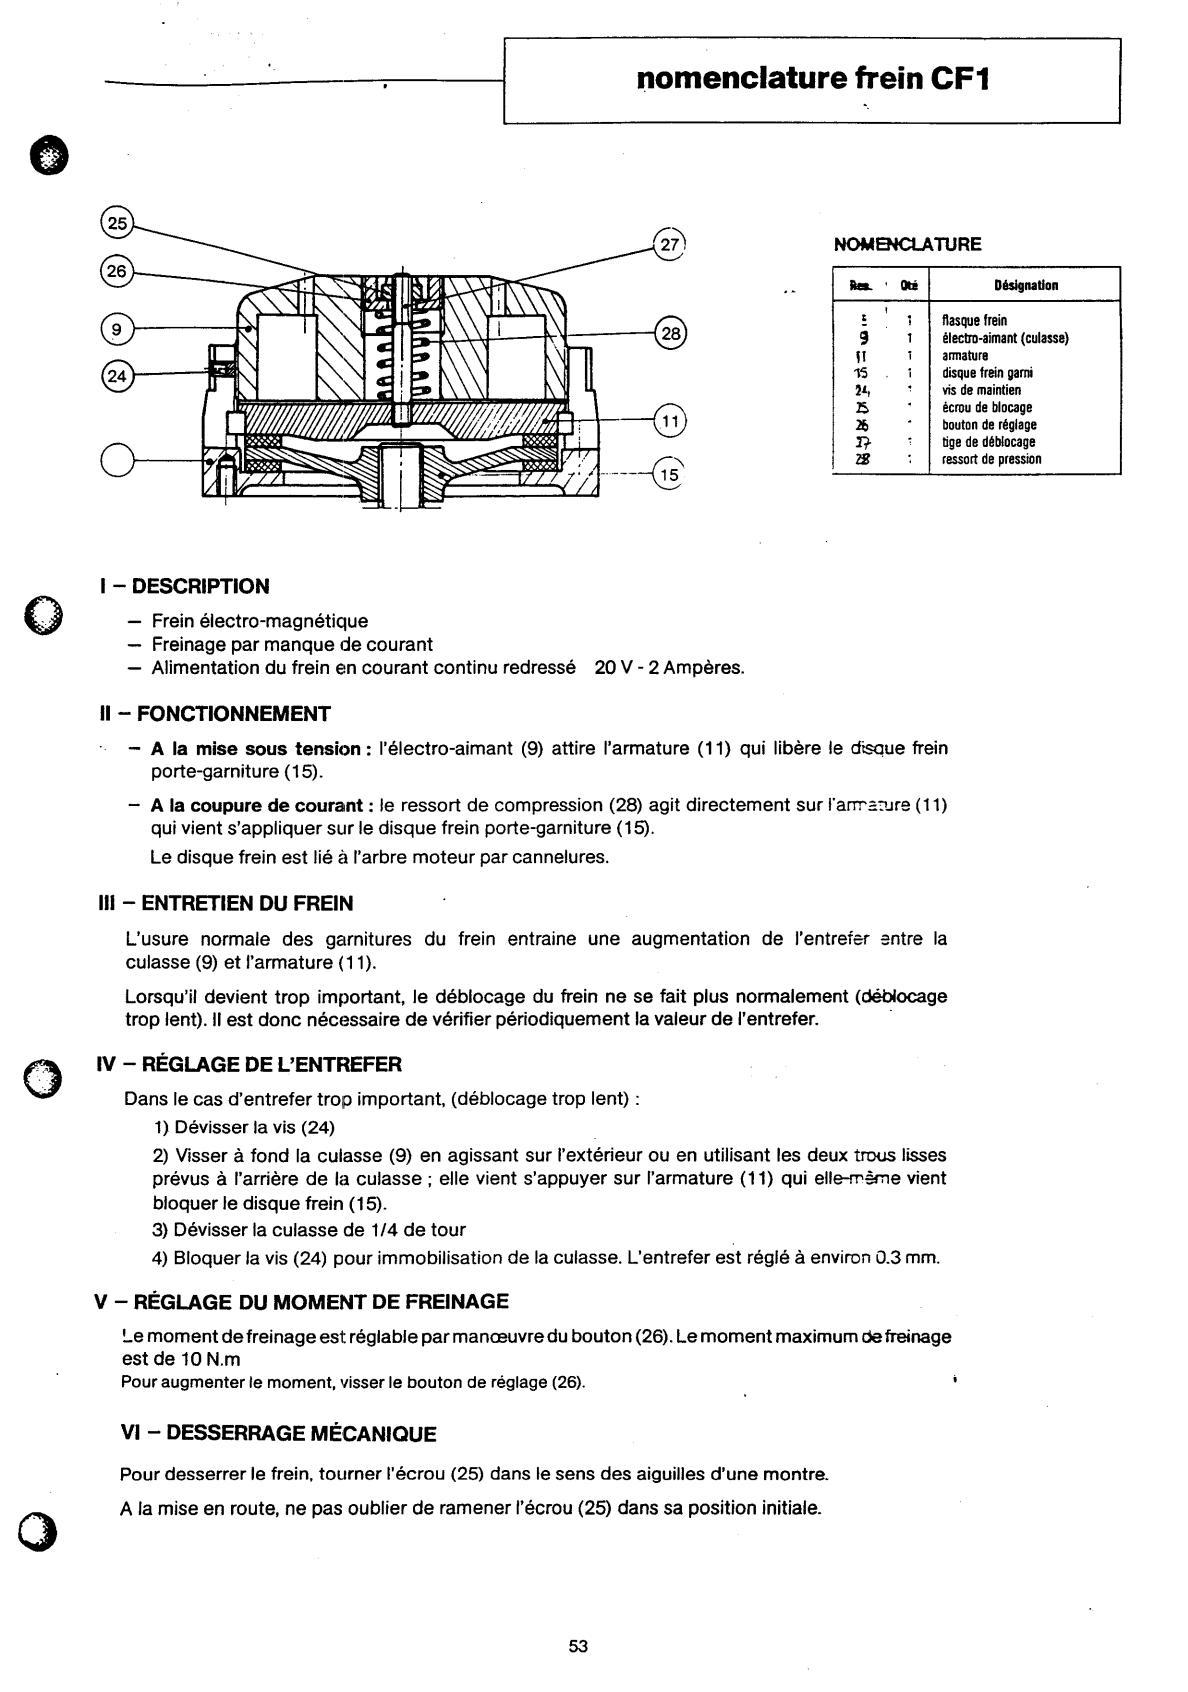 Moteur-frein Leroy Somer FCO-FCL-FCM + Frein CF1 Uw1156